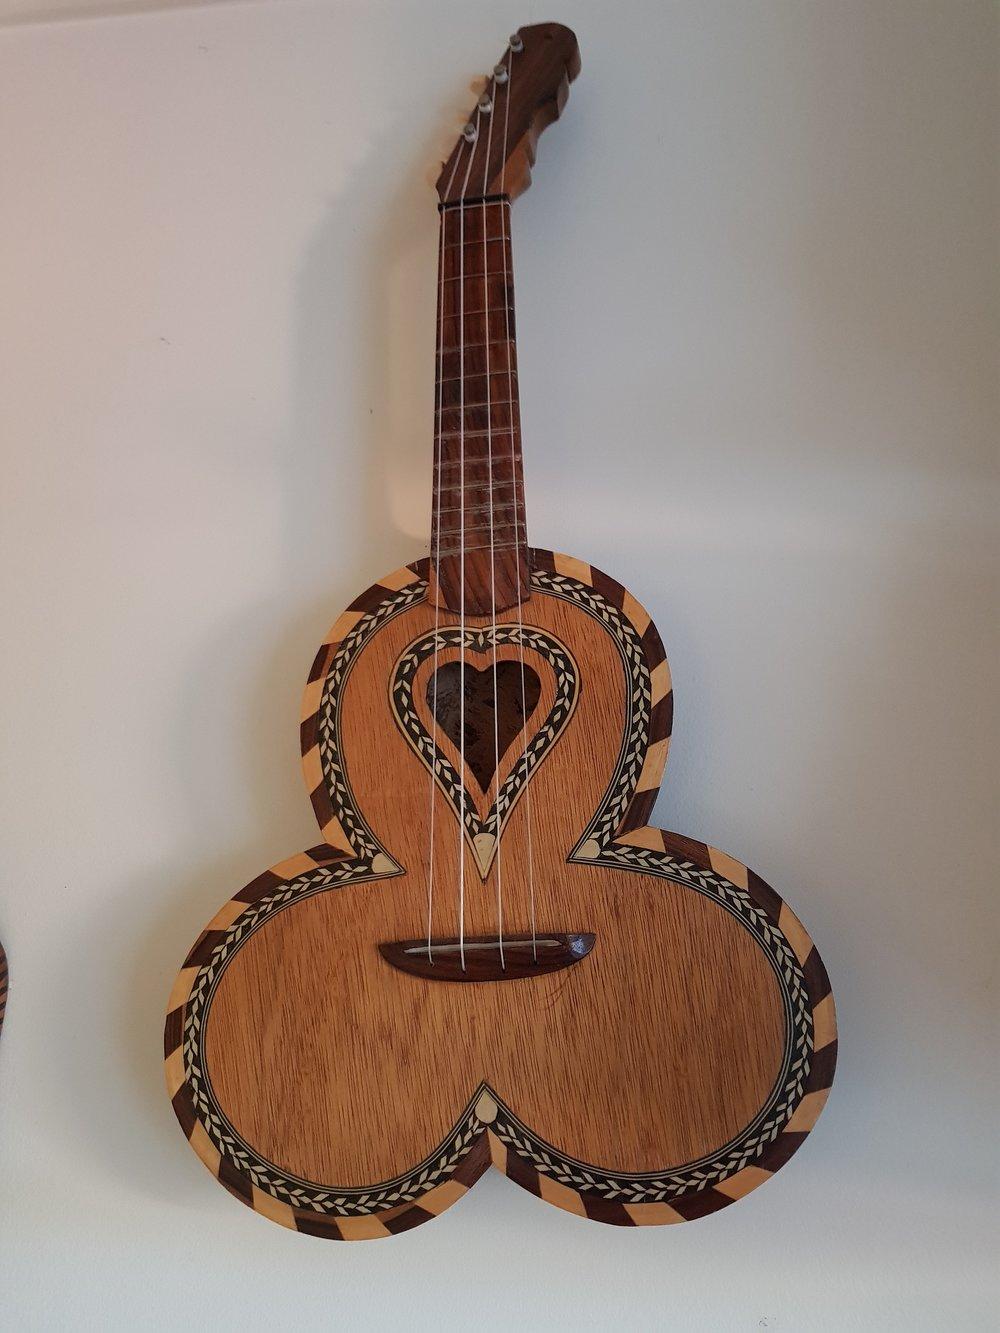 Michael Rosenberg's tri-coconut ukulele -